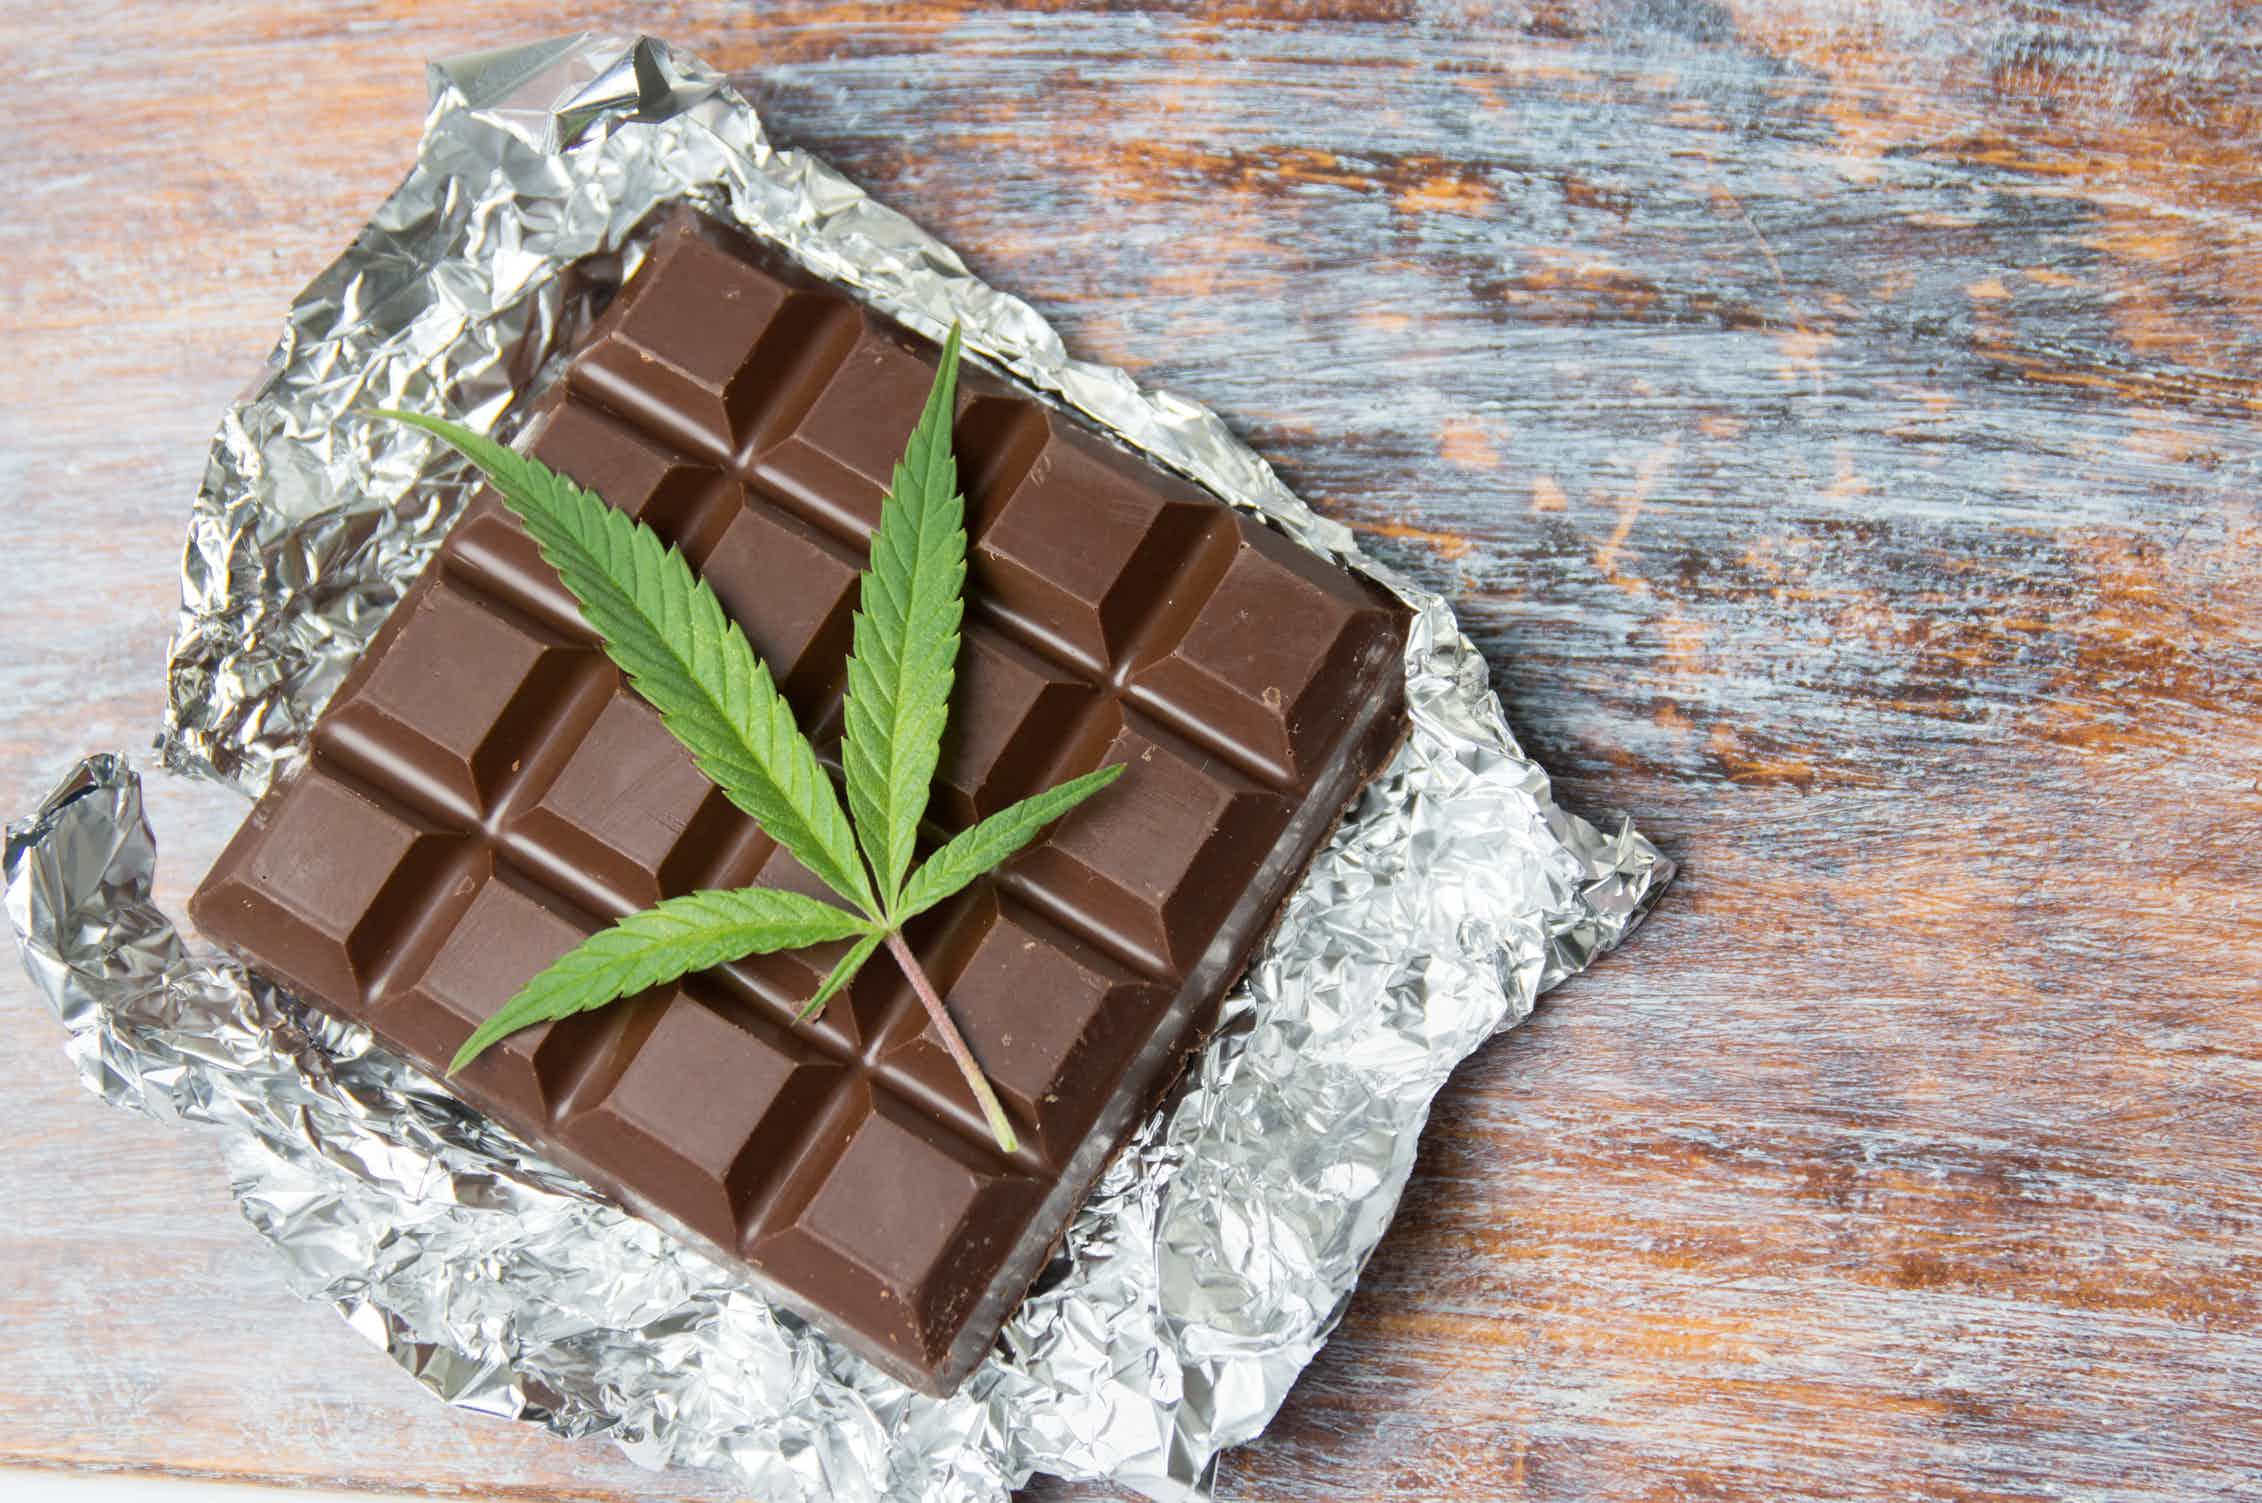 эффект от конопли в шоколаде